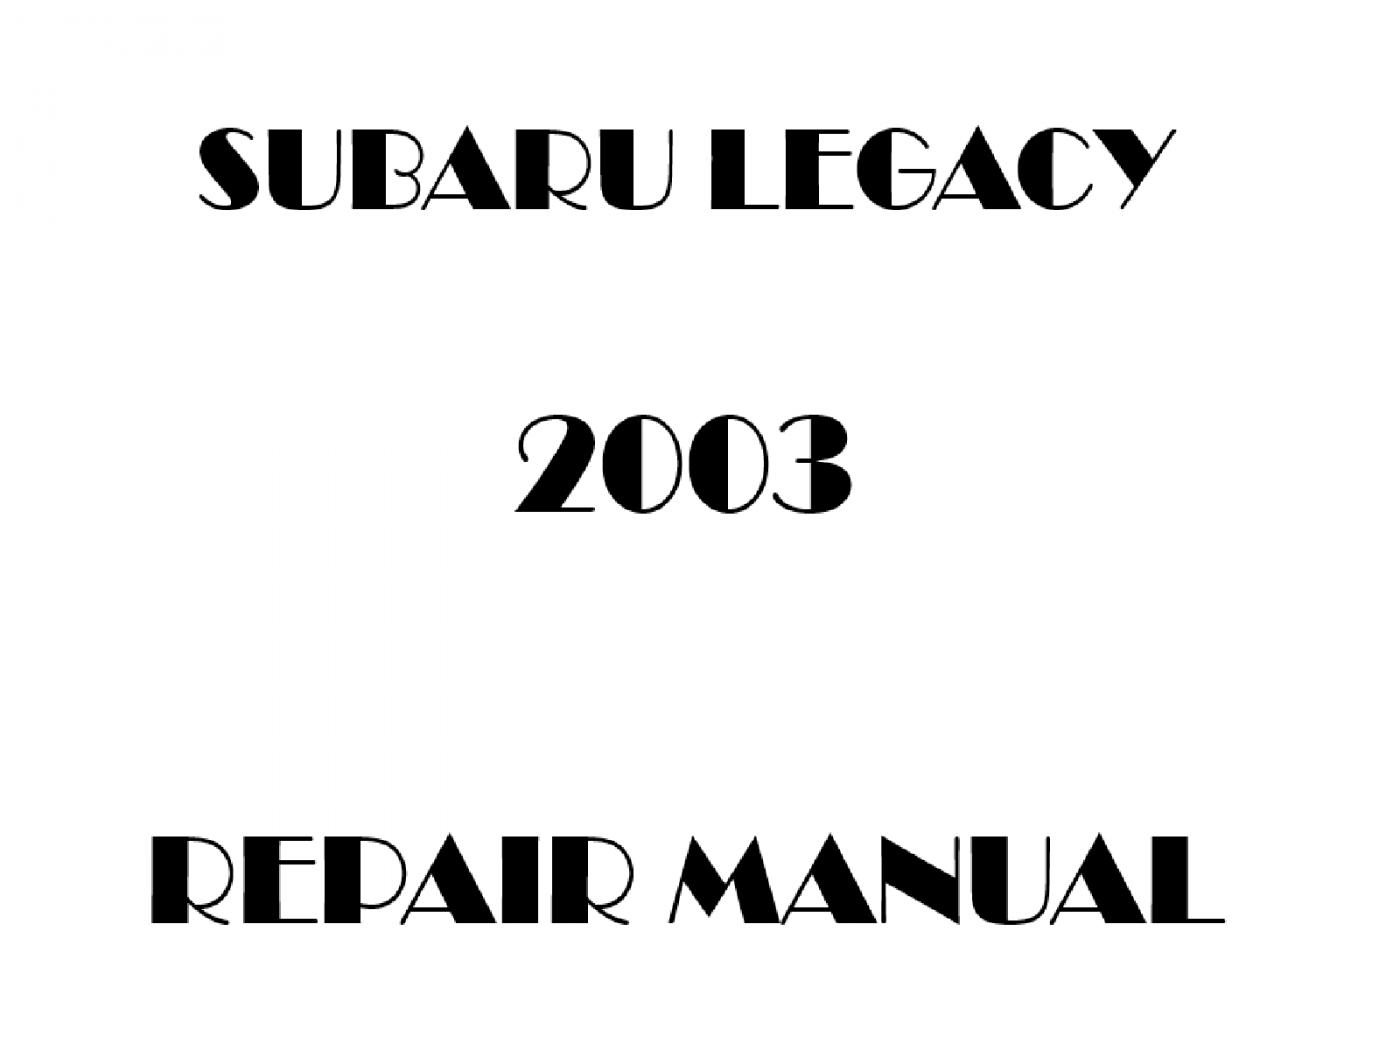 2003 Subaru Legacy repair manual